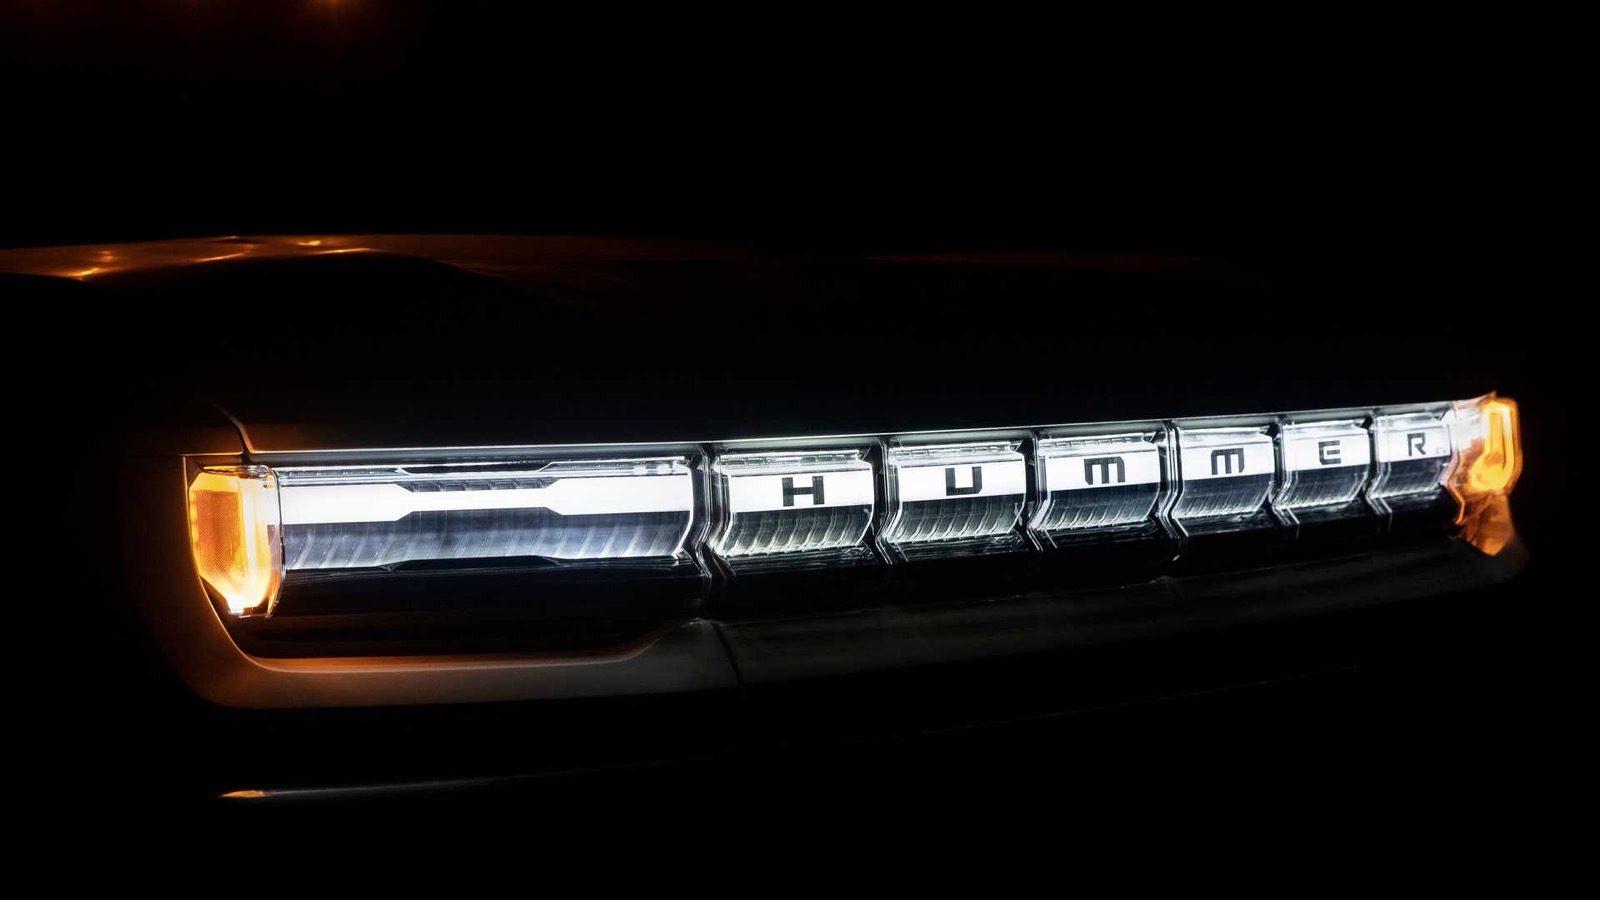 gmc-hummer-ev-pickup-2020-970-011.jpg